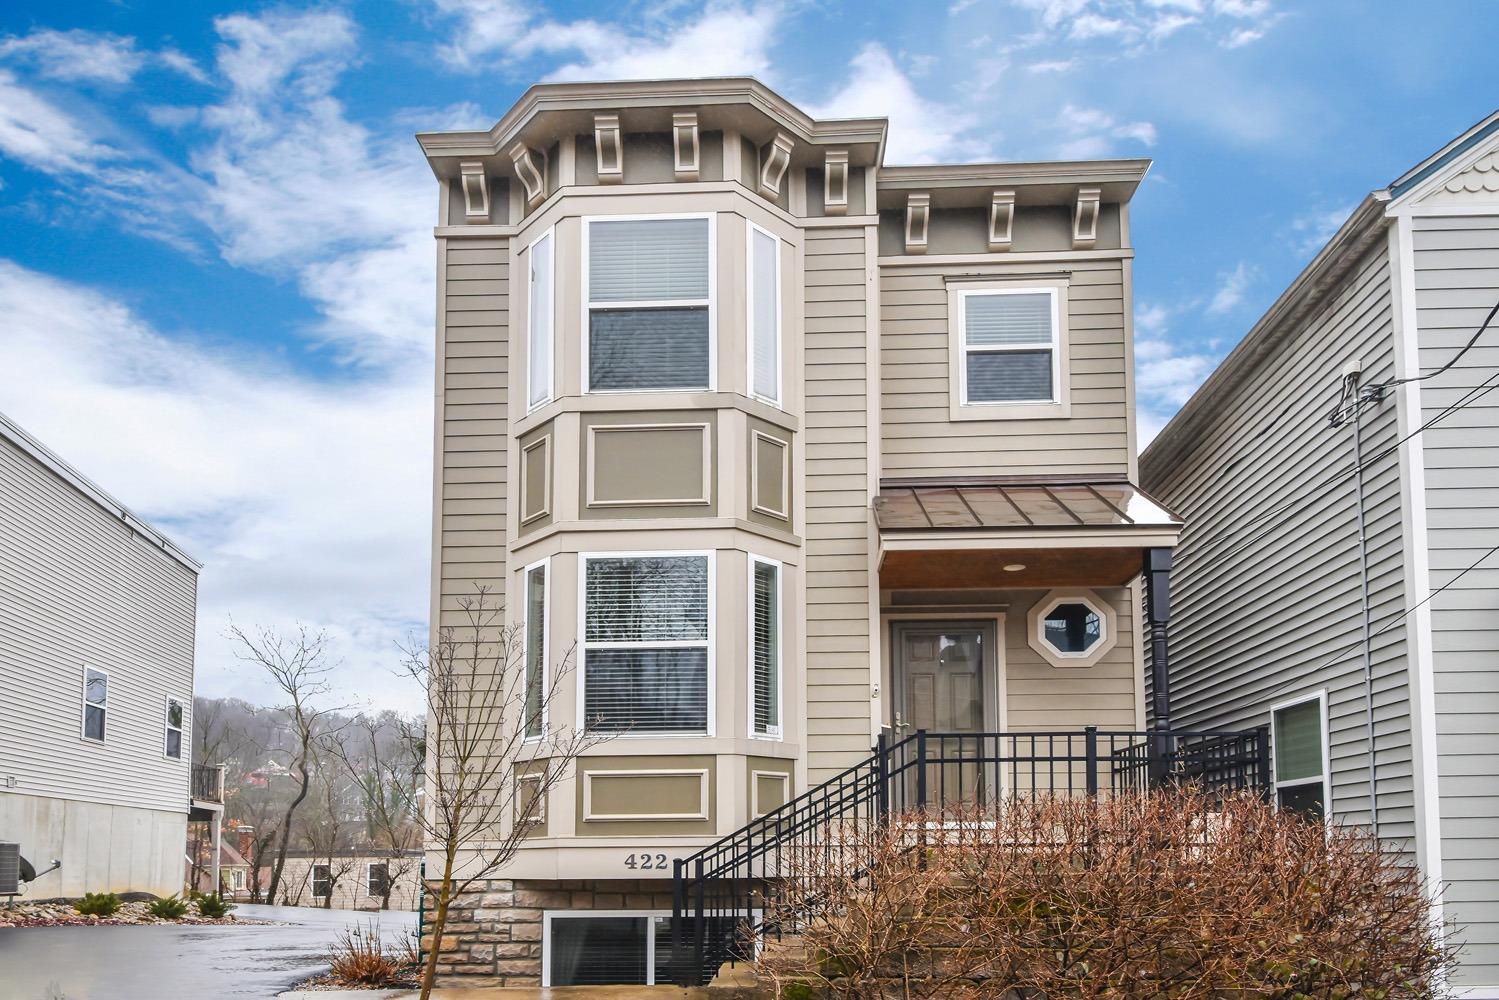 Property for sale at 422 Strafer Street, Cincinnati,  Ohio 45226